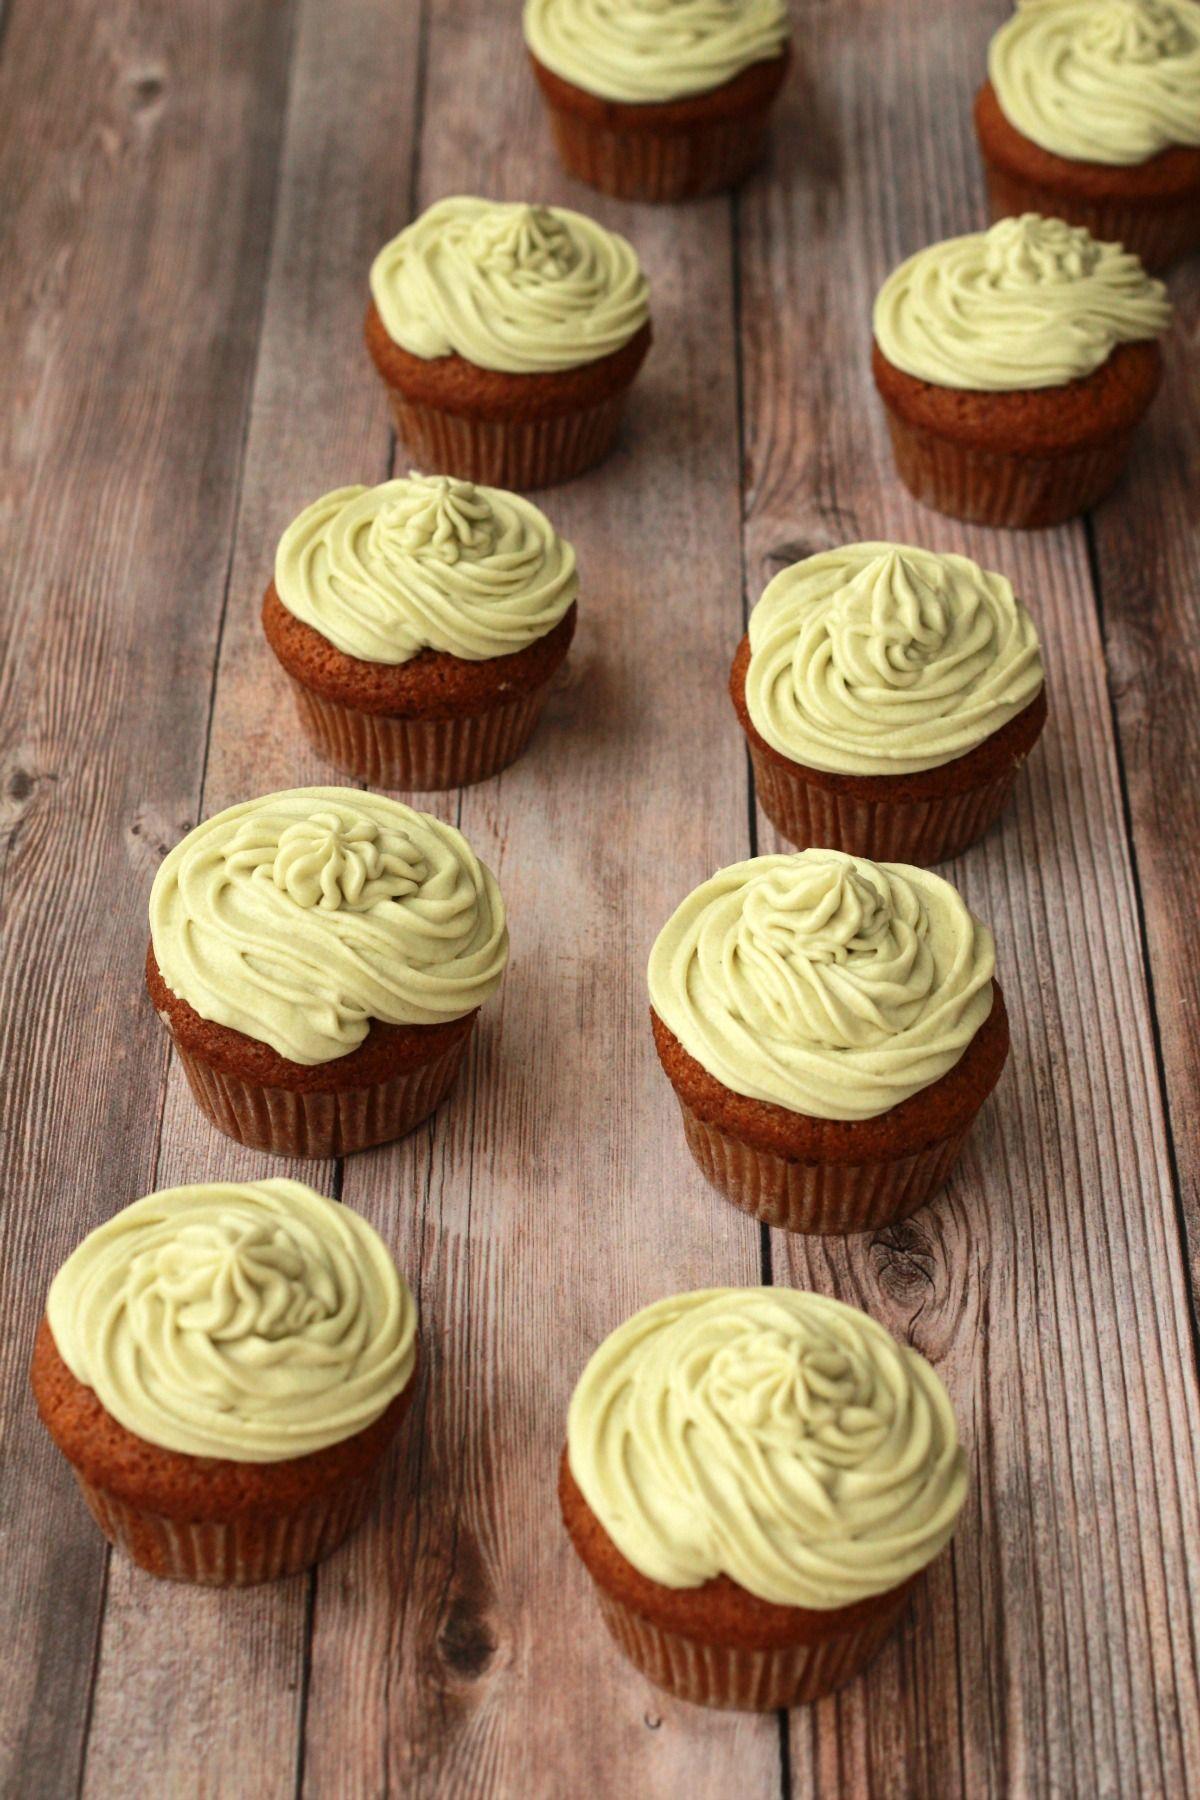 Gluten Free Vegan Vanilla Cupcakes With Matcha Green Tea Frosting Vegan Lovingitvegan Glu Vegan Vanilla Cupcakes Vanilla Cupcakes Vegan Gluten Free Desserts